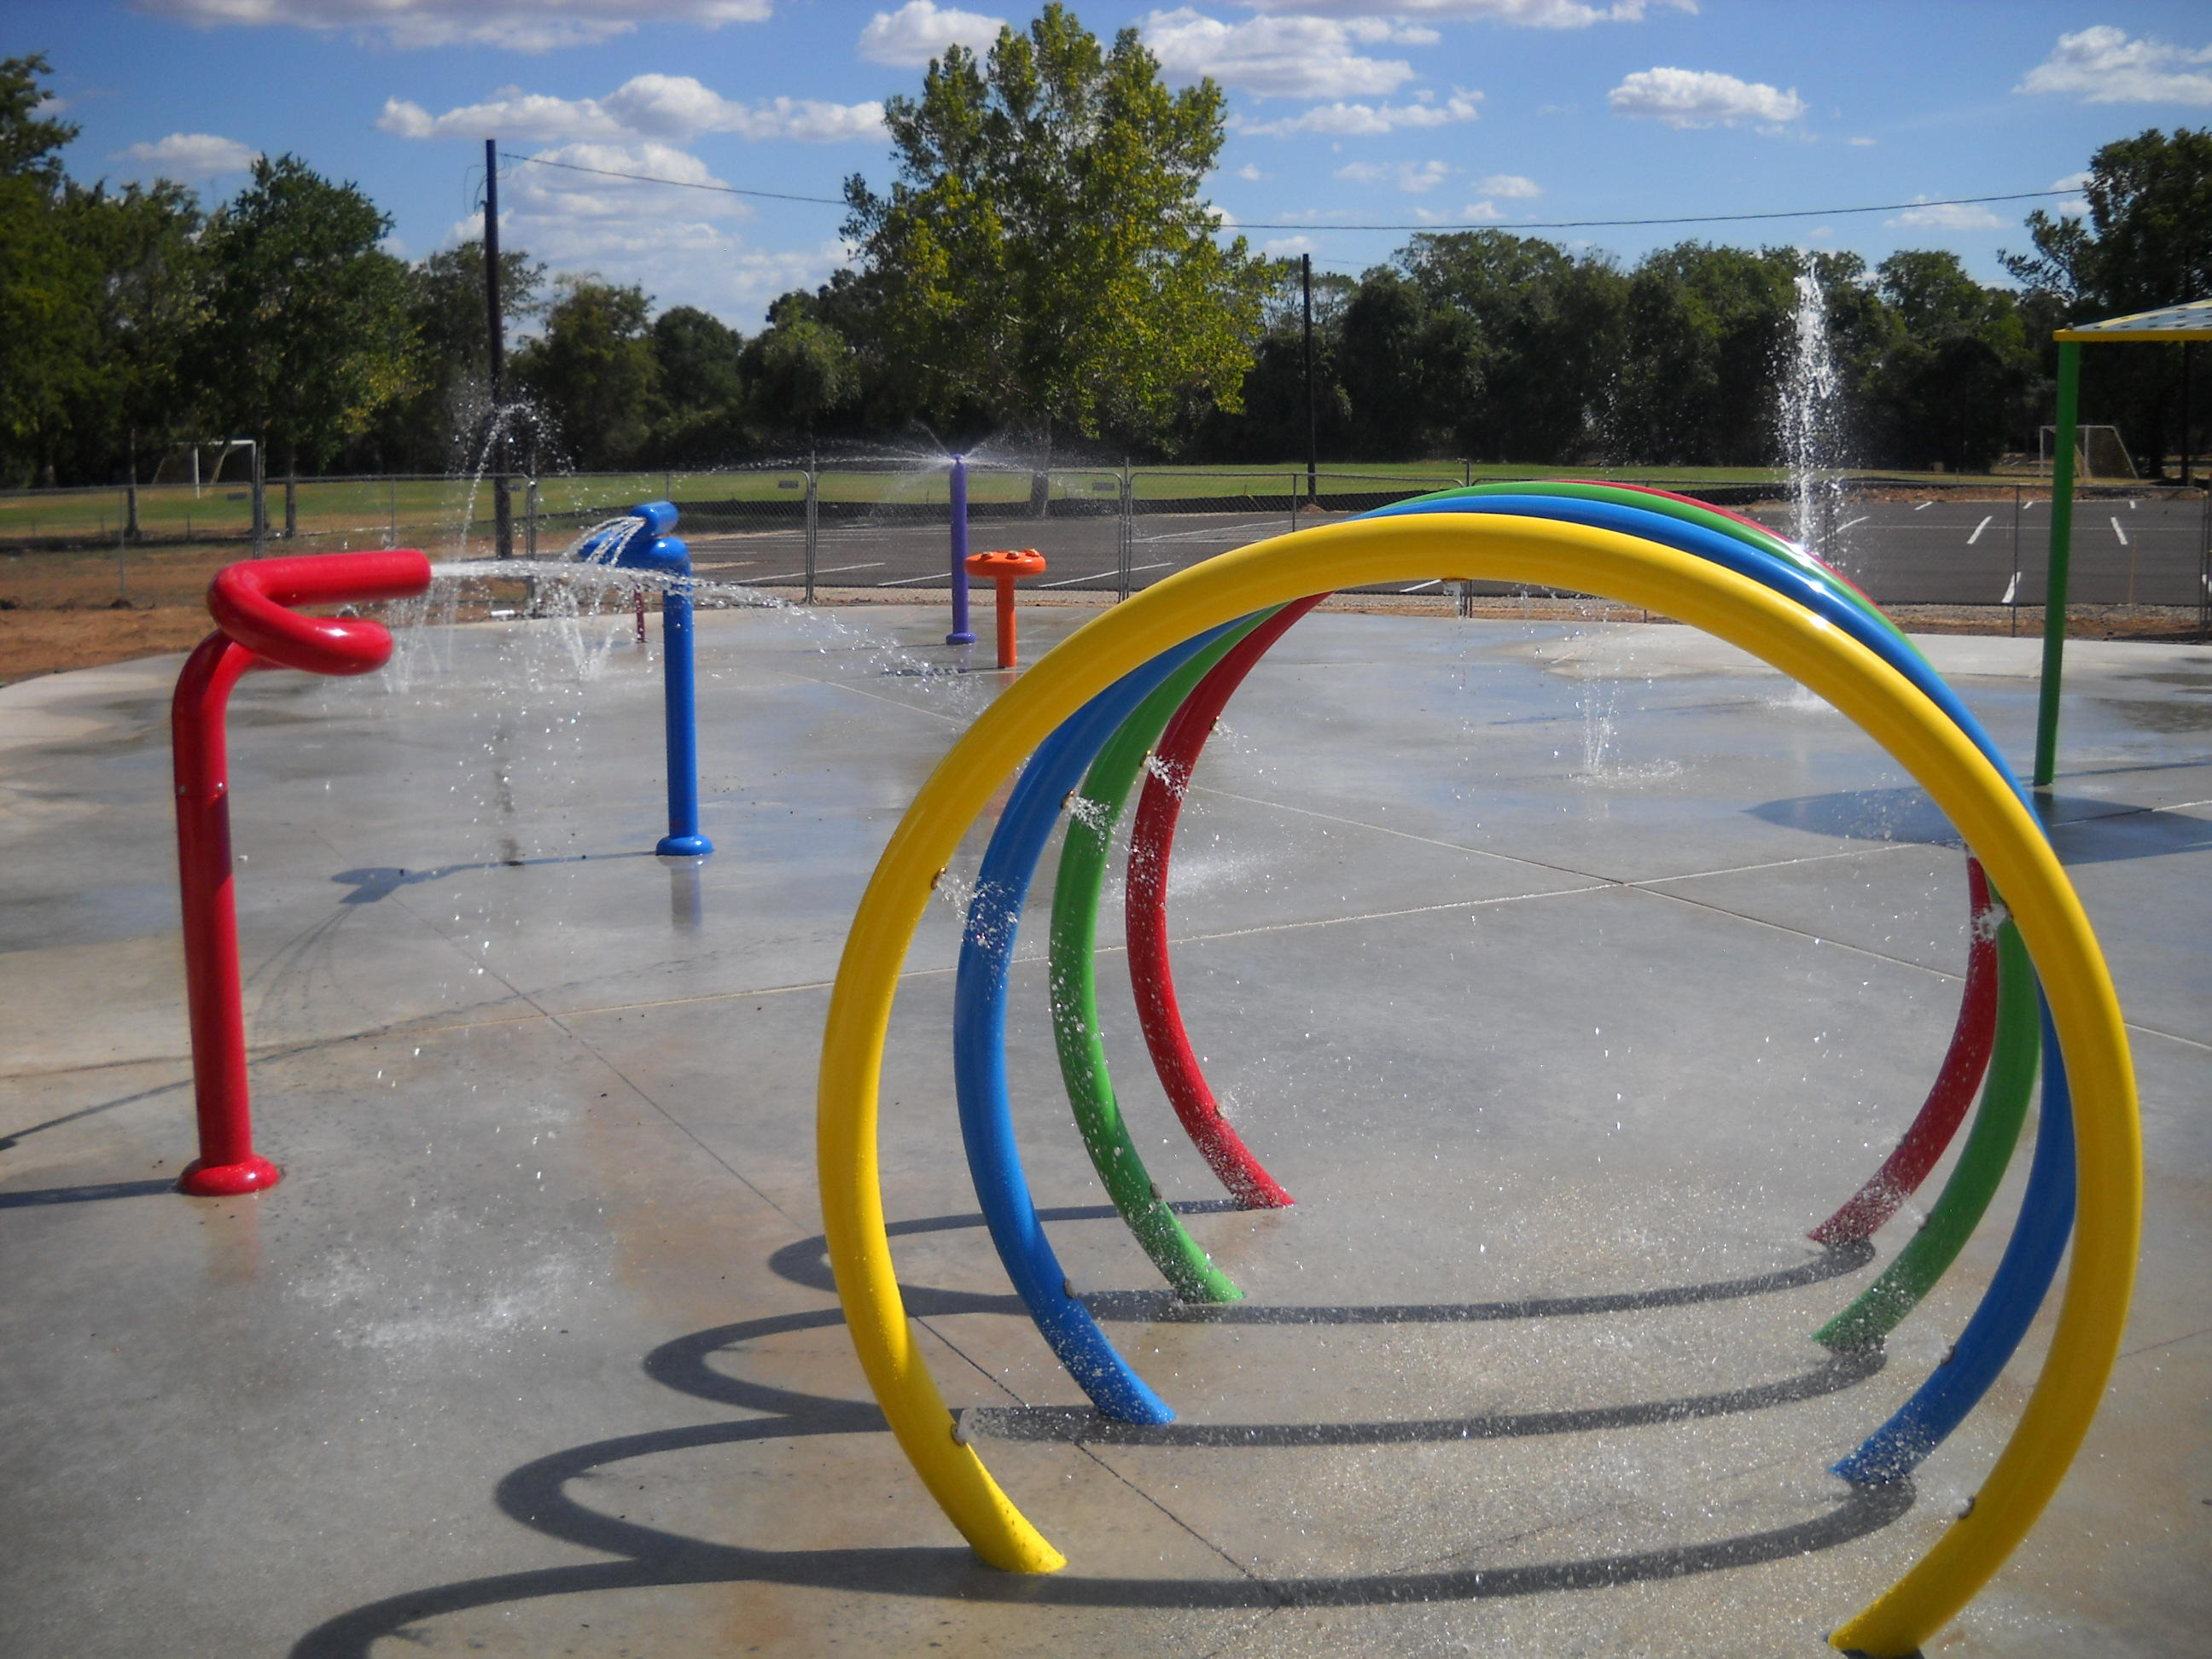 Adventure Playground Systems image 4